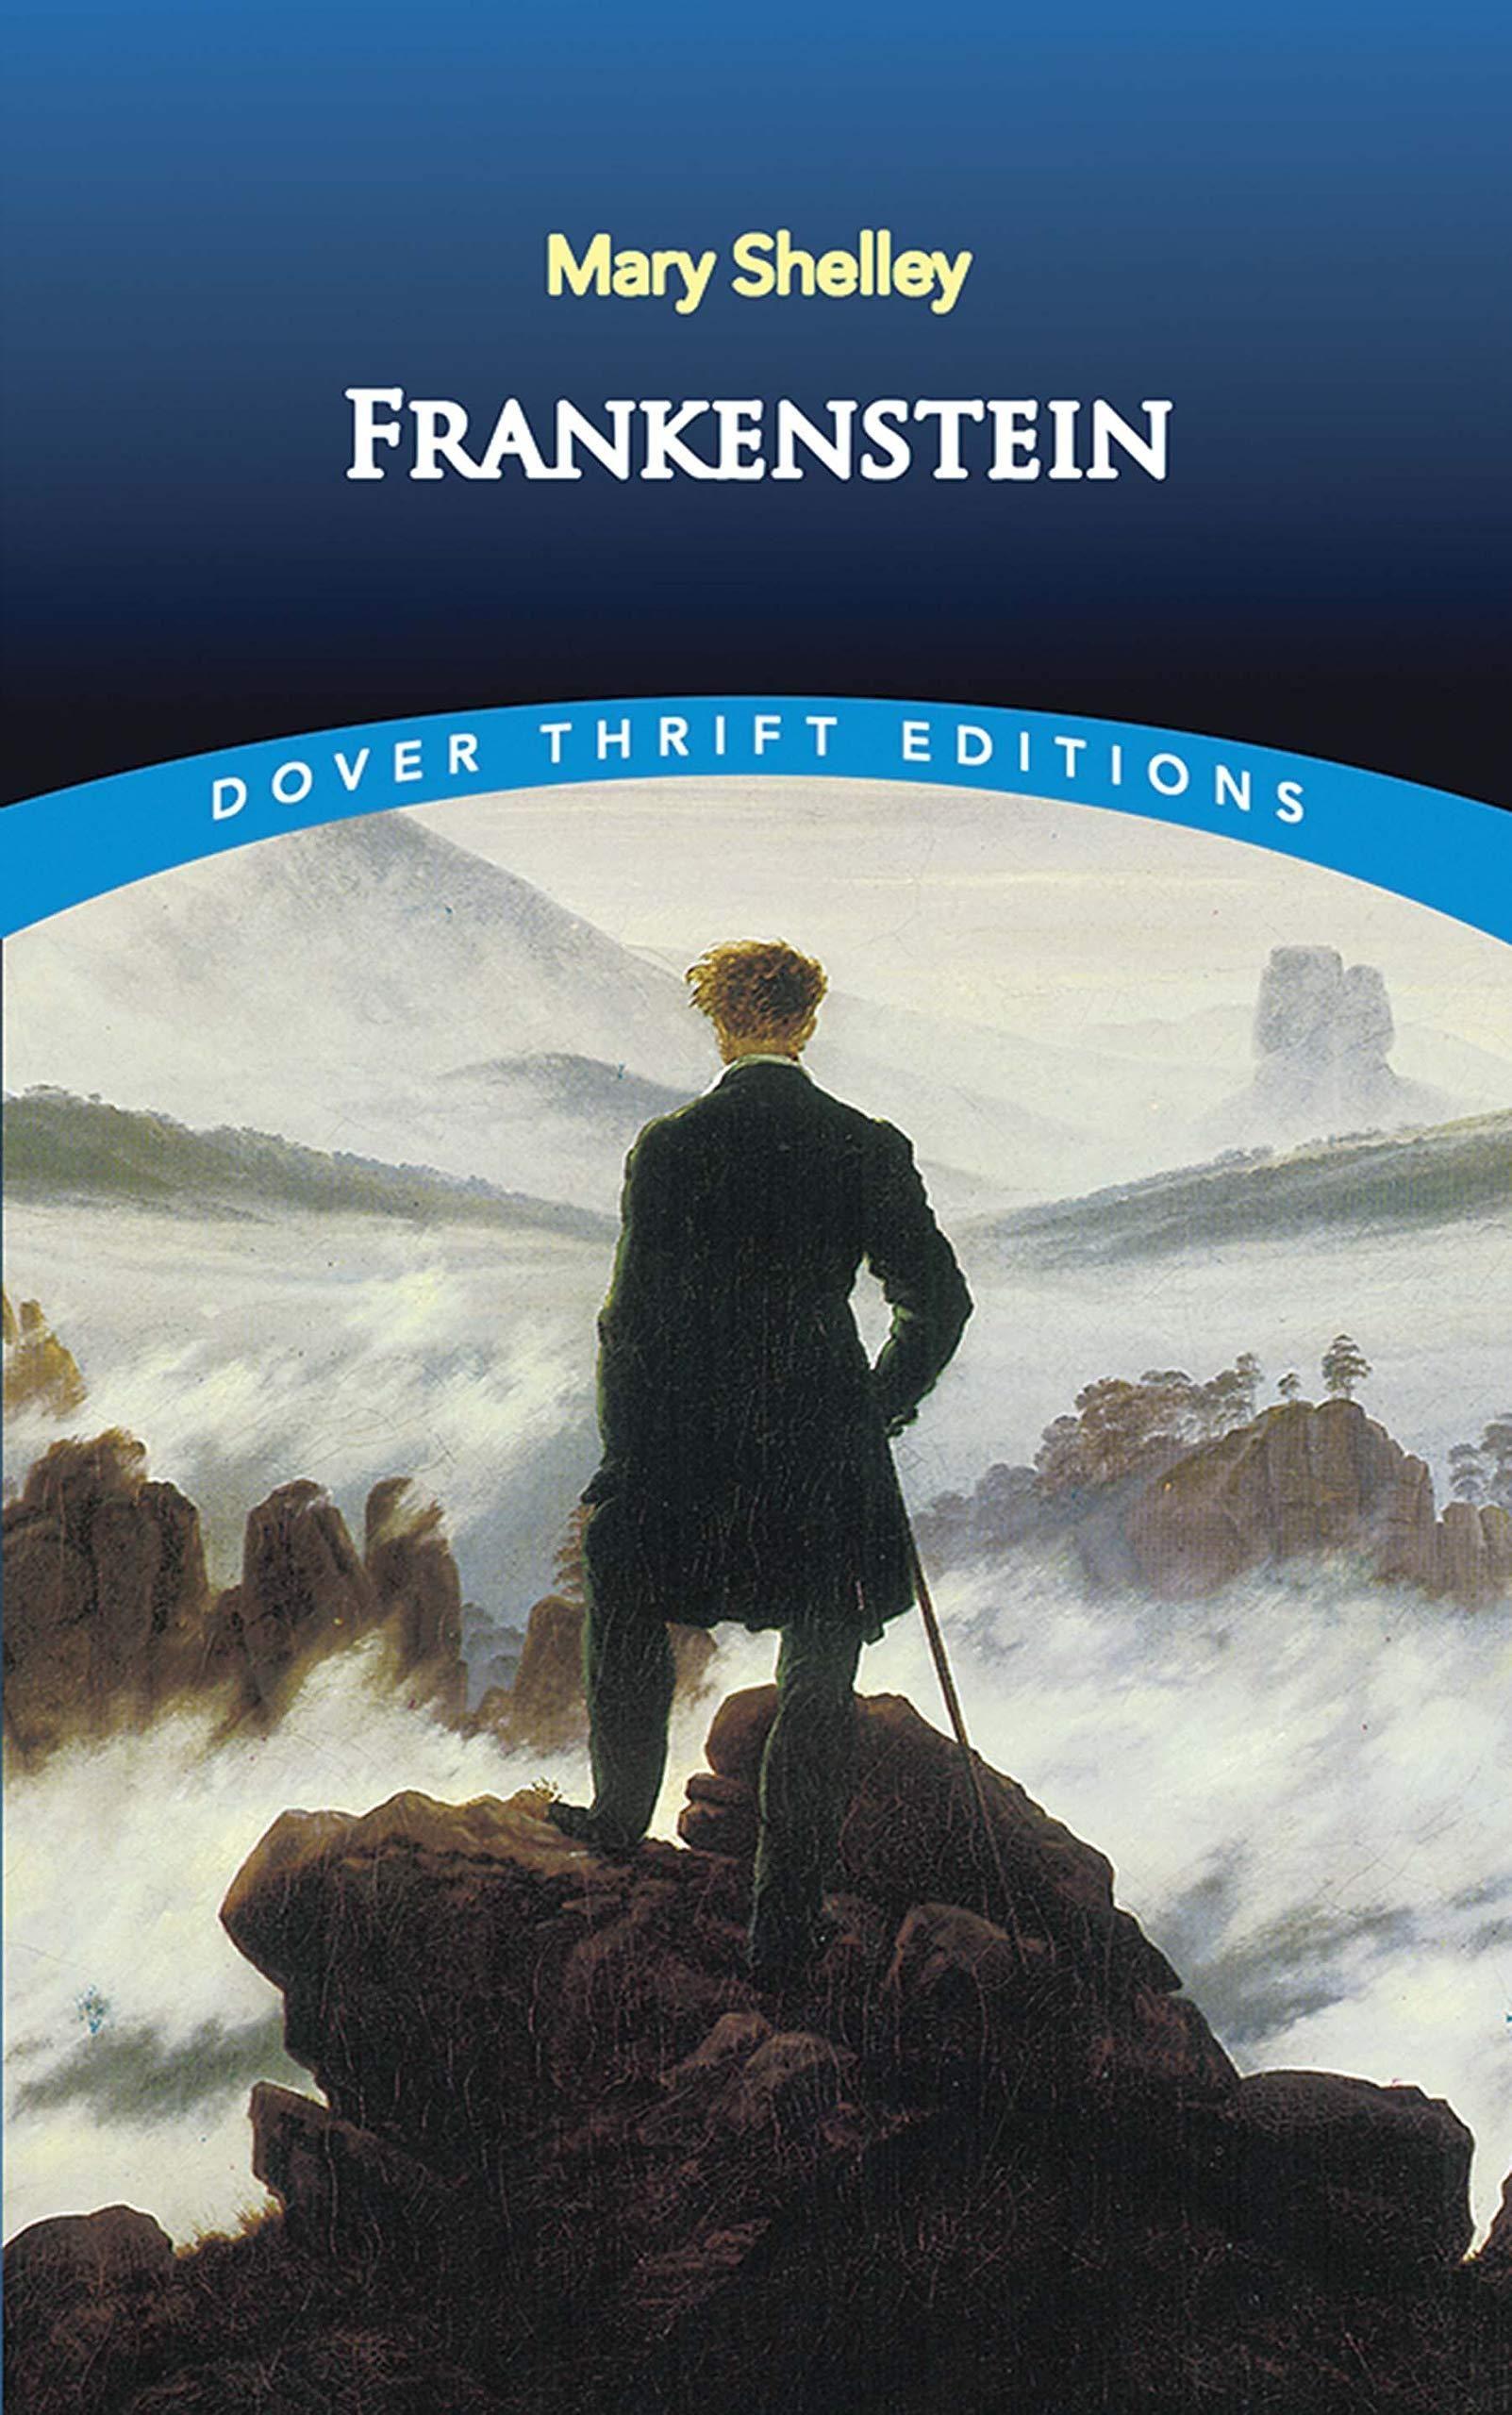 Free Donwload Frankenstein Populer Ebook Em 2020 Diary Of A Wimpy Kid